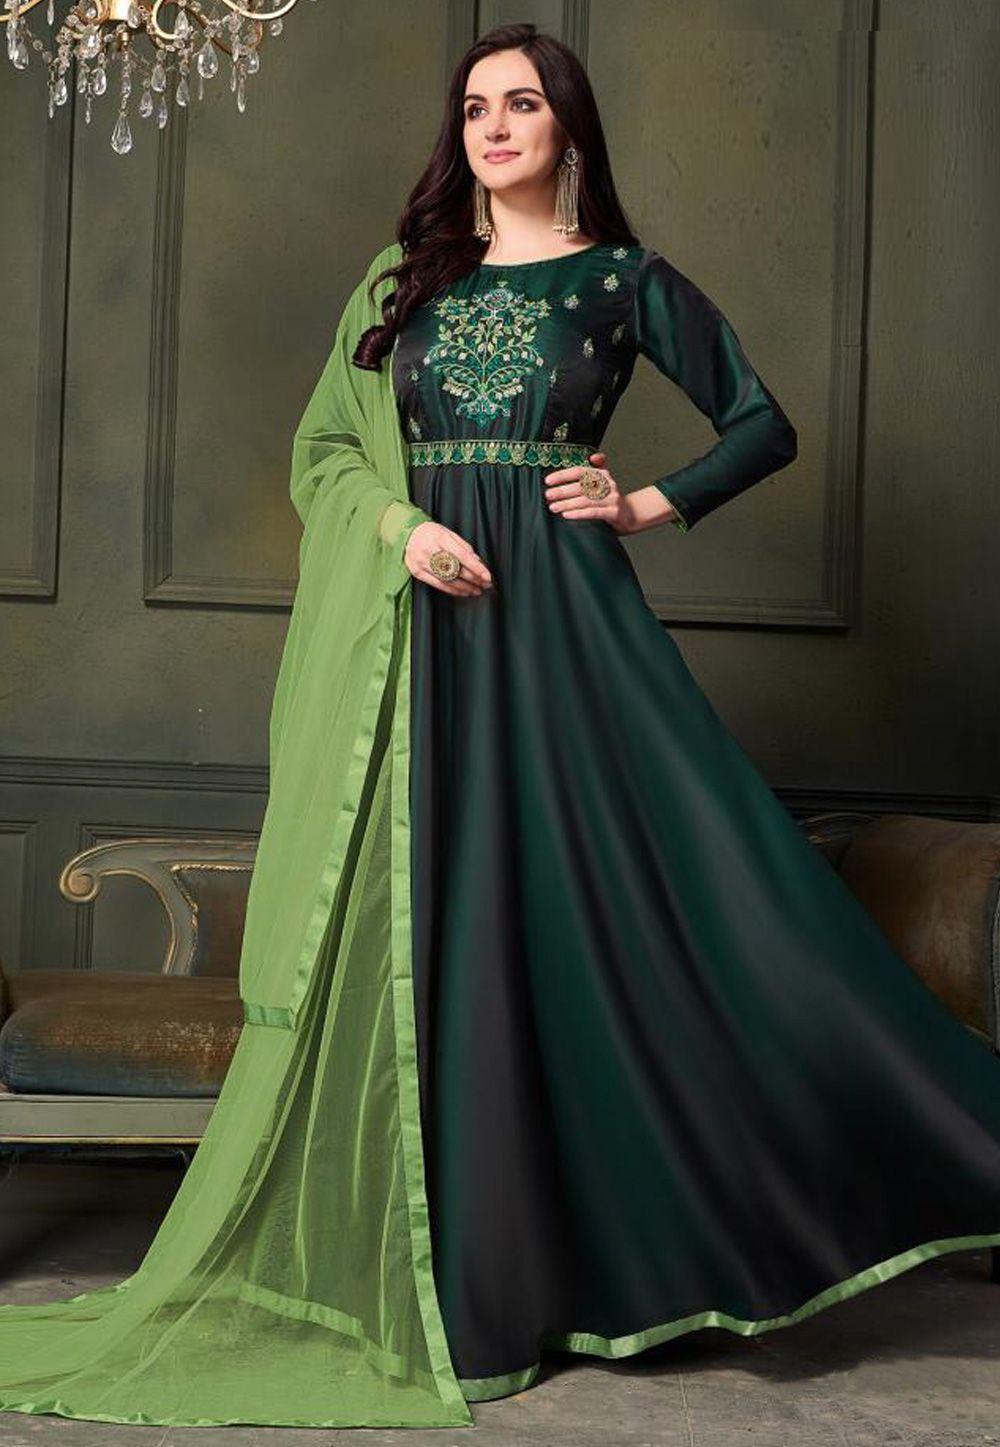 d8e4bd4ed9 Buy Green Taffeta Flared Long Anarkali Suit 158670 online at lowest price  from huge collection of salwar kameez at Indianclothstore.com.